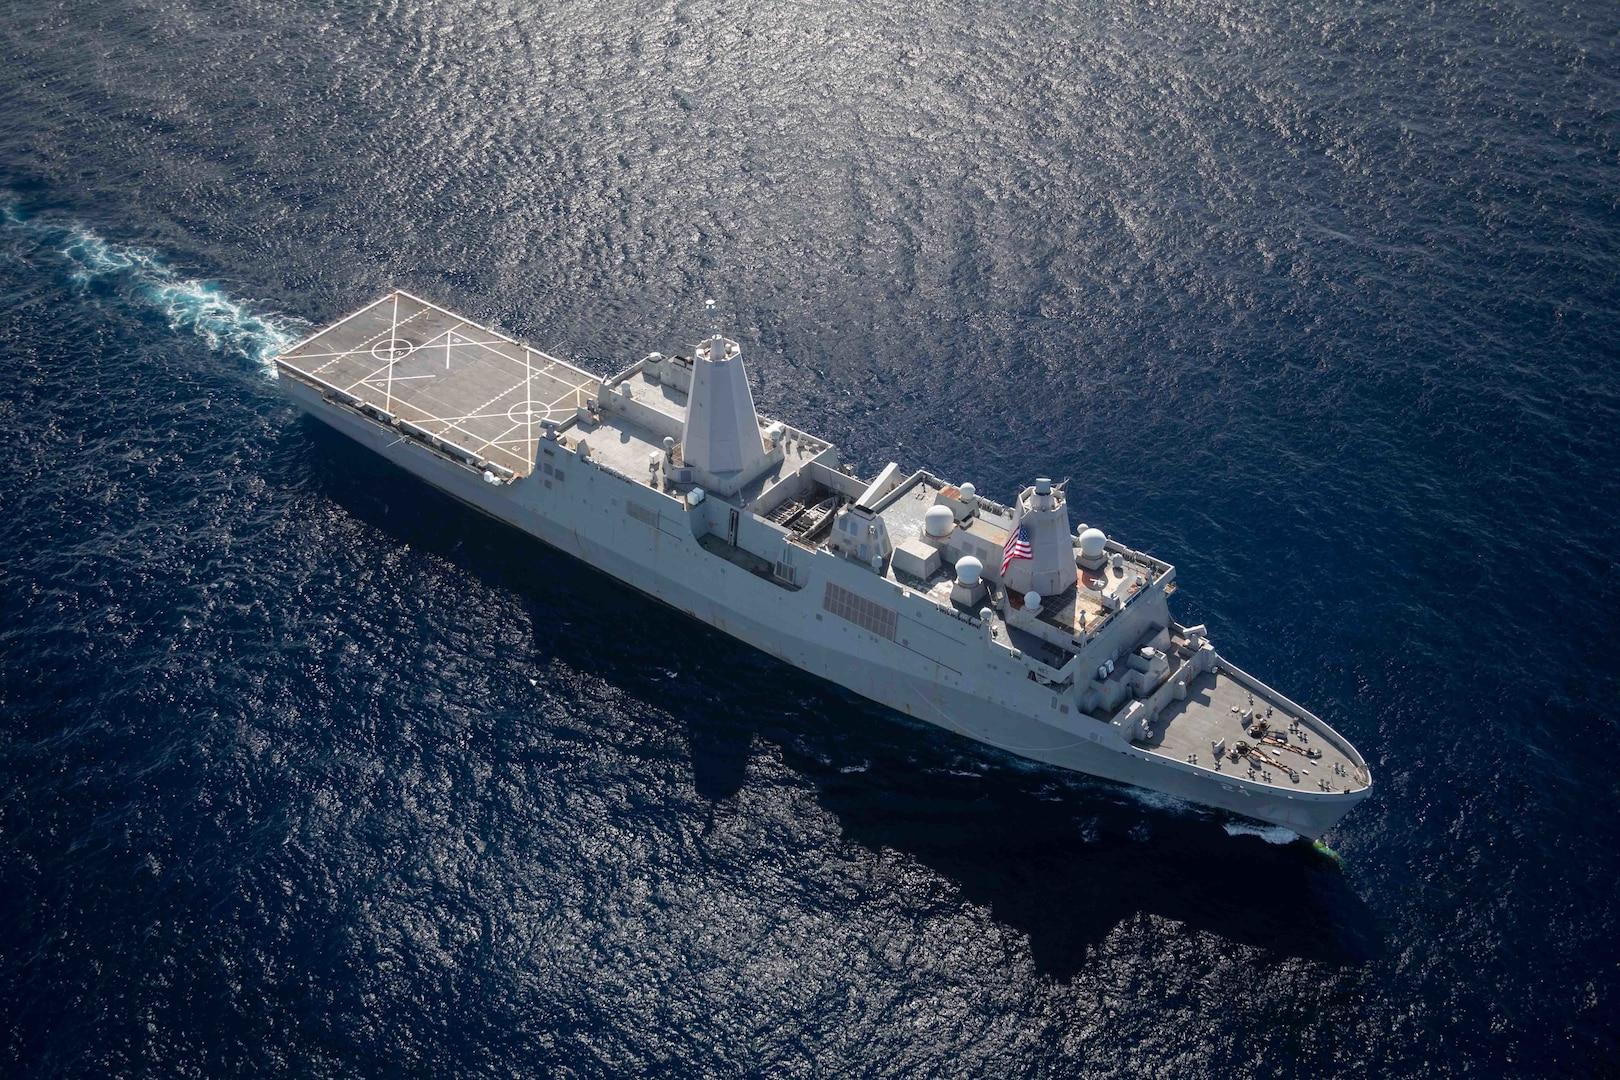 The San Antonio-class amphibious transport dock ship USS Arlington (LPD 24) transits the Atlantic Ocean Aug. 14, 2021.